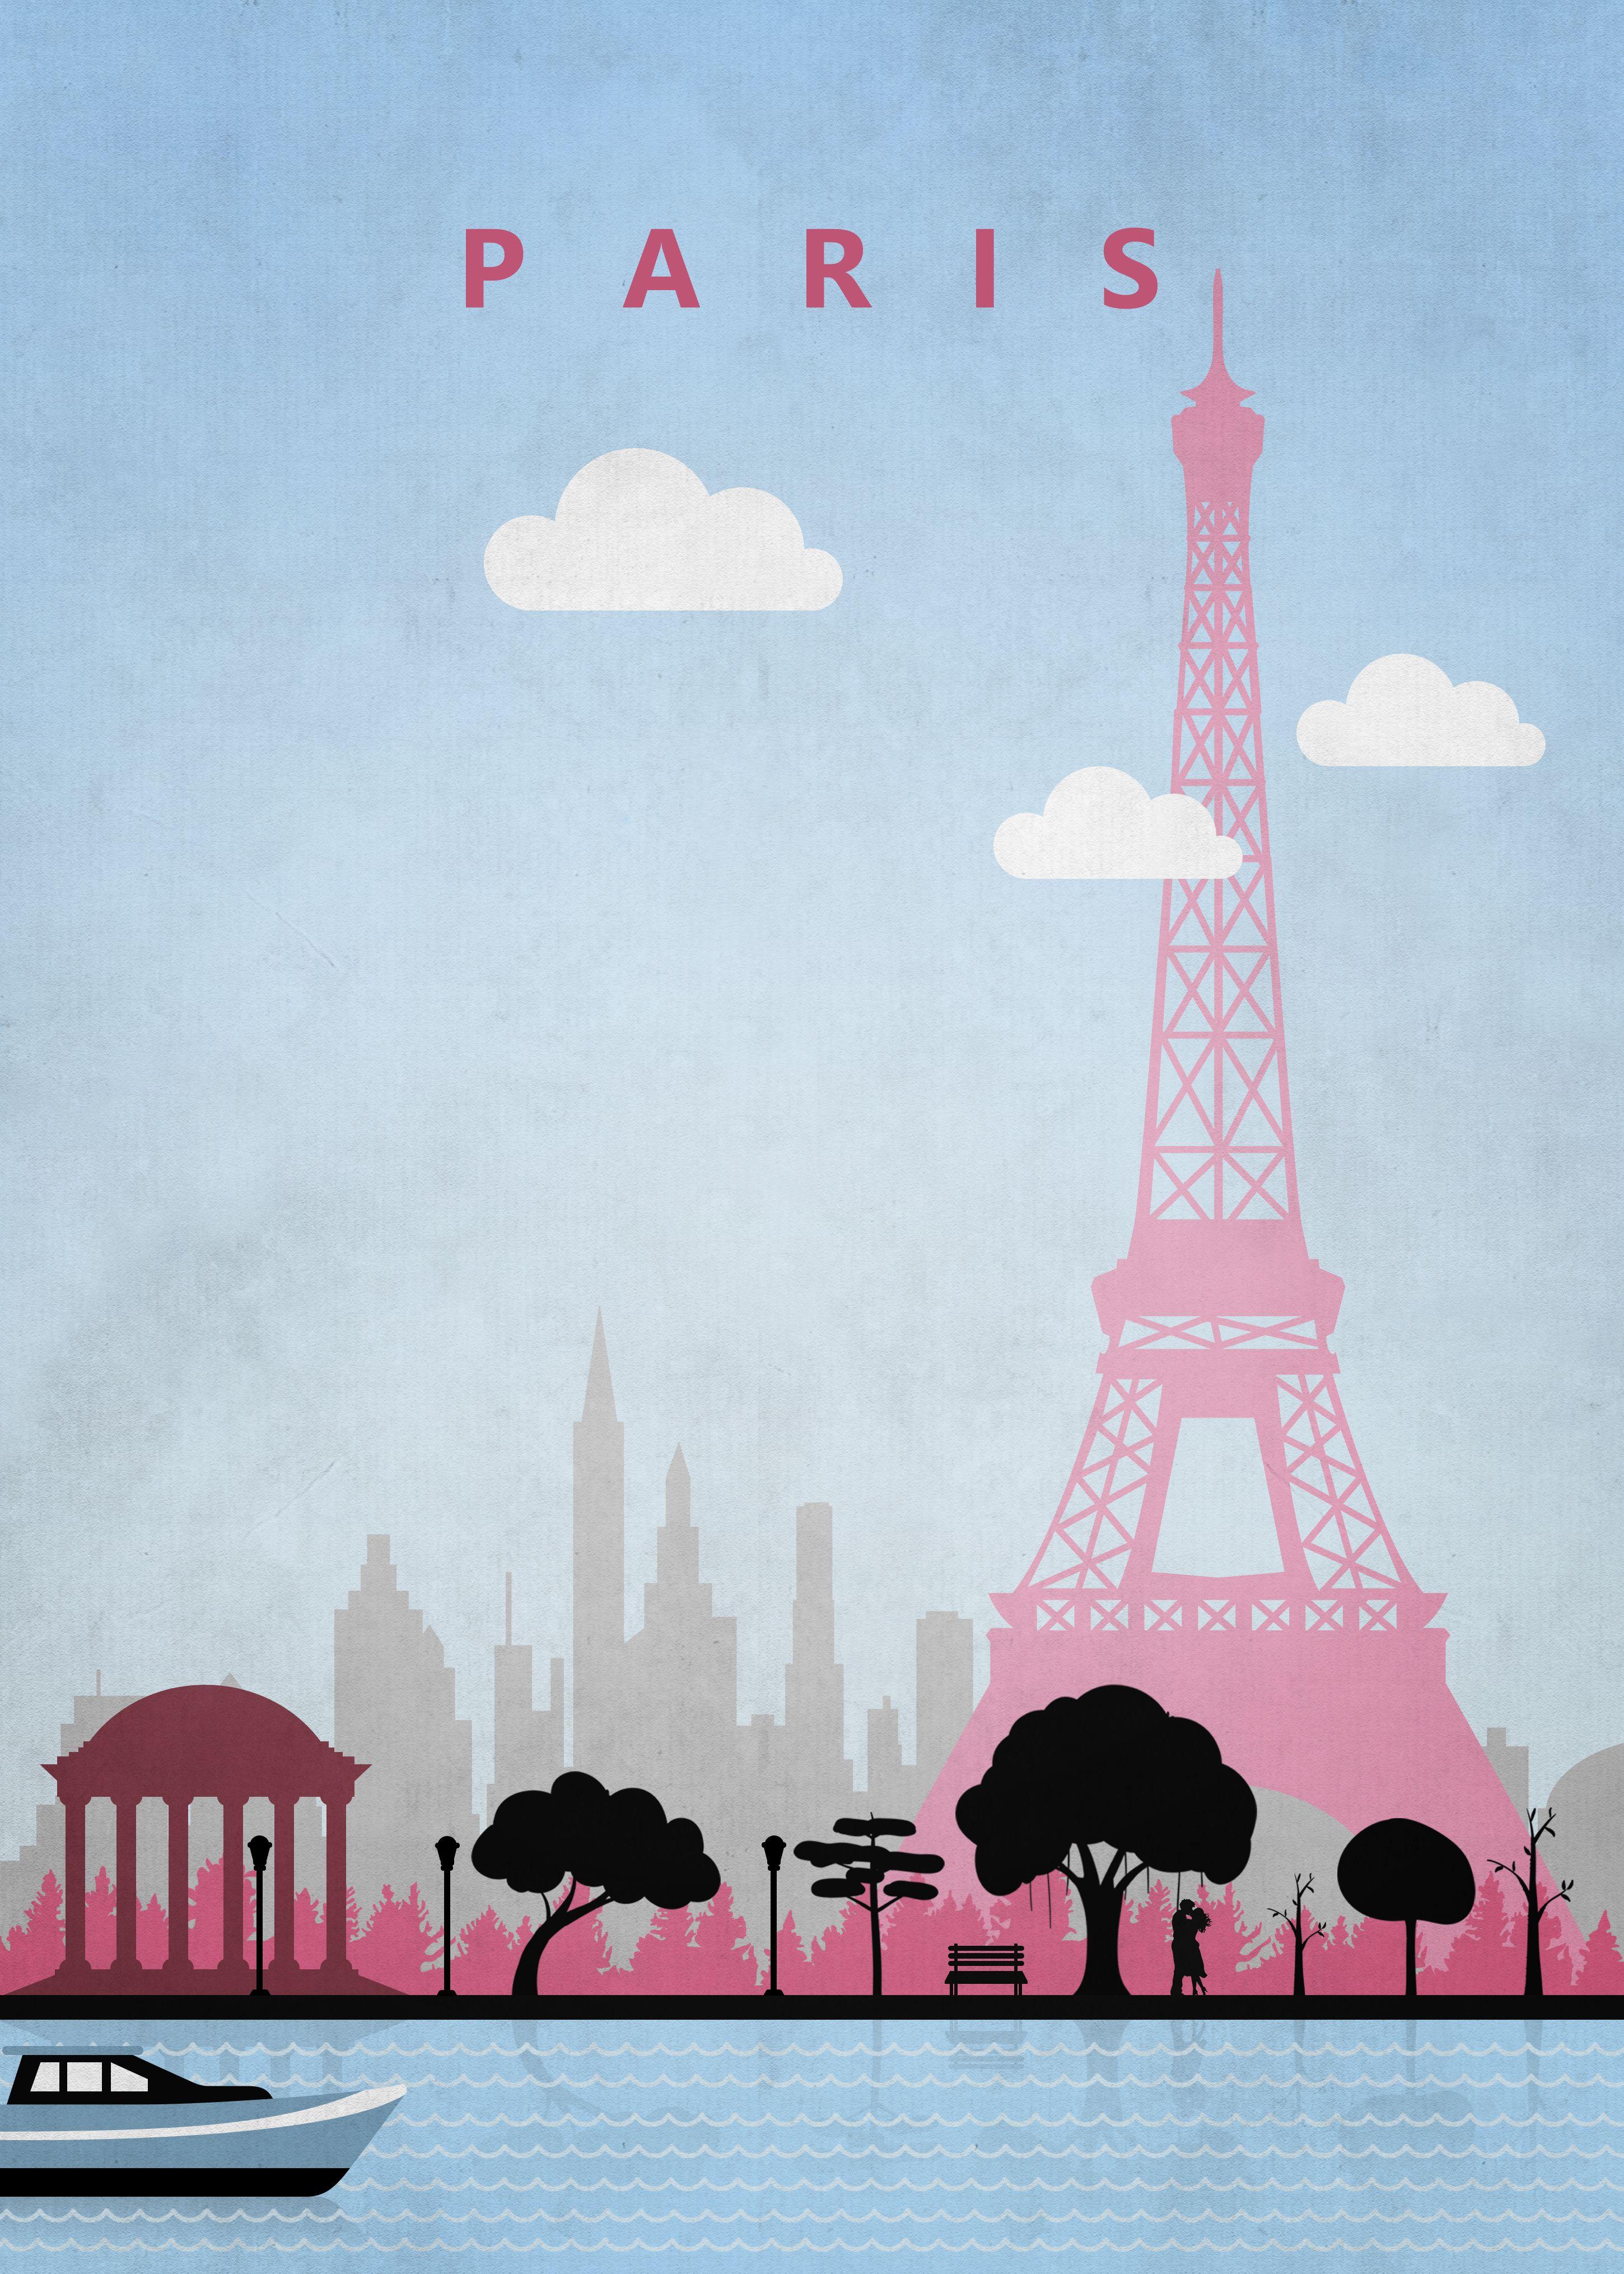 Paris Travel Poster Poster Print By Black Foxe Displate Paris Travel Poster Paris Poster Vintage Poster Prints